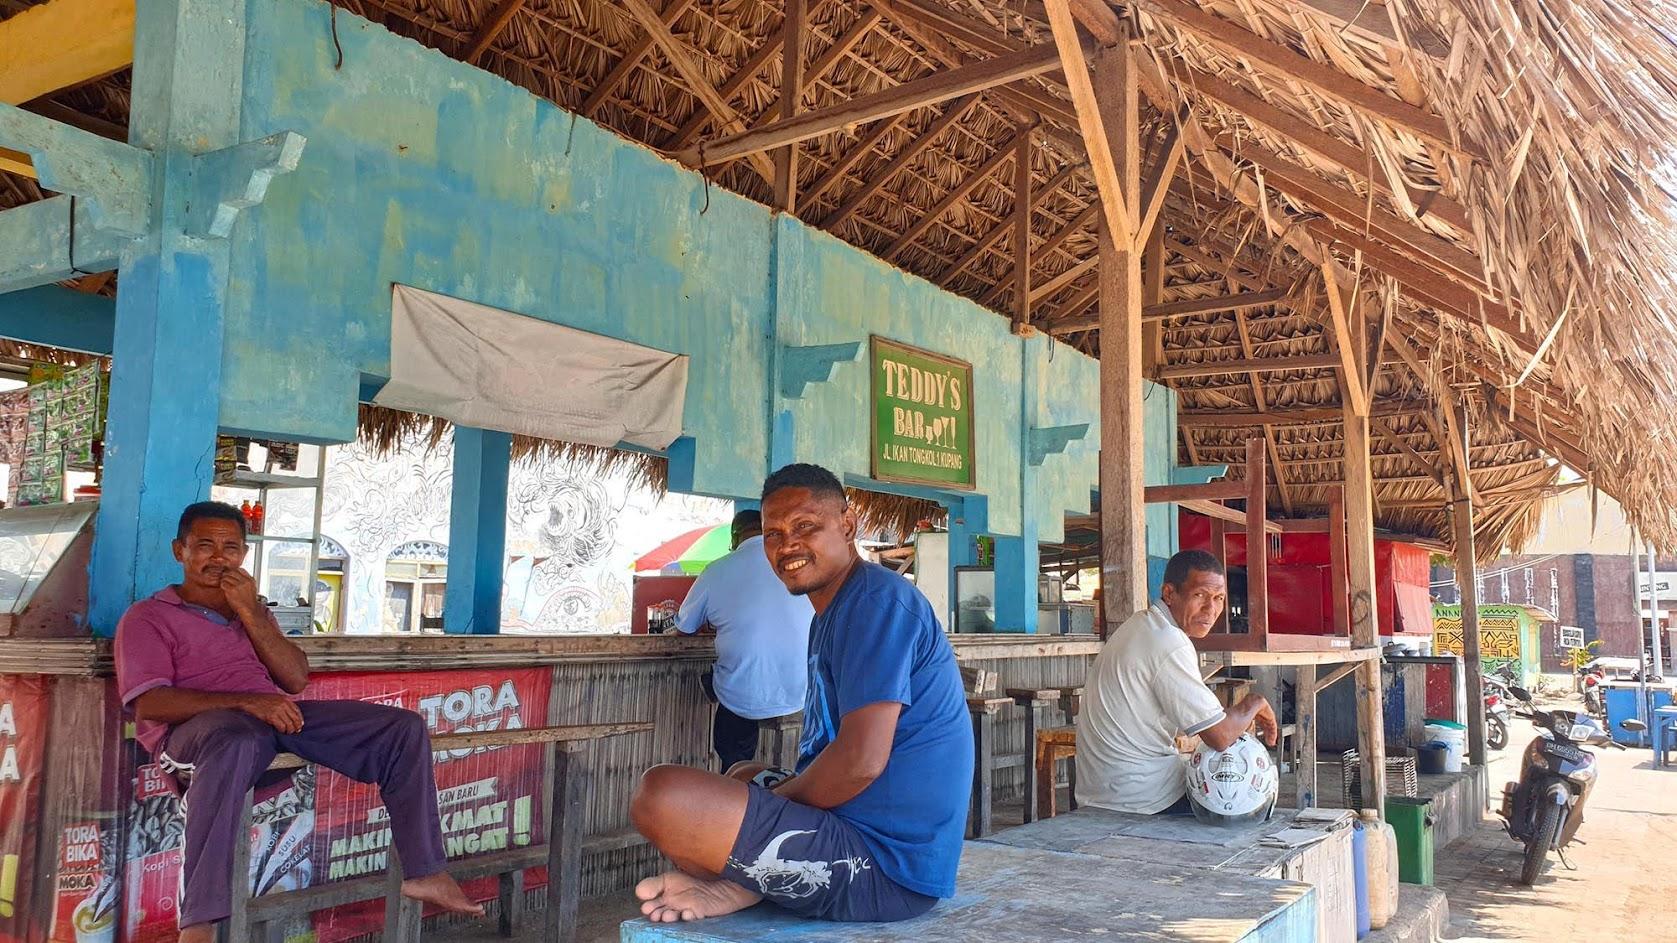 DIA 74 - Sentir Kupang, a capital de TIMOR OCIDENTAL